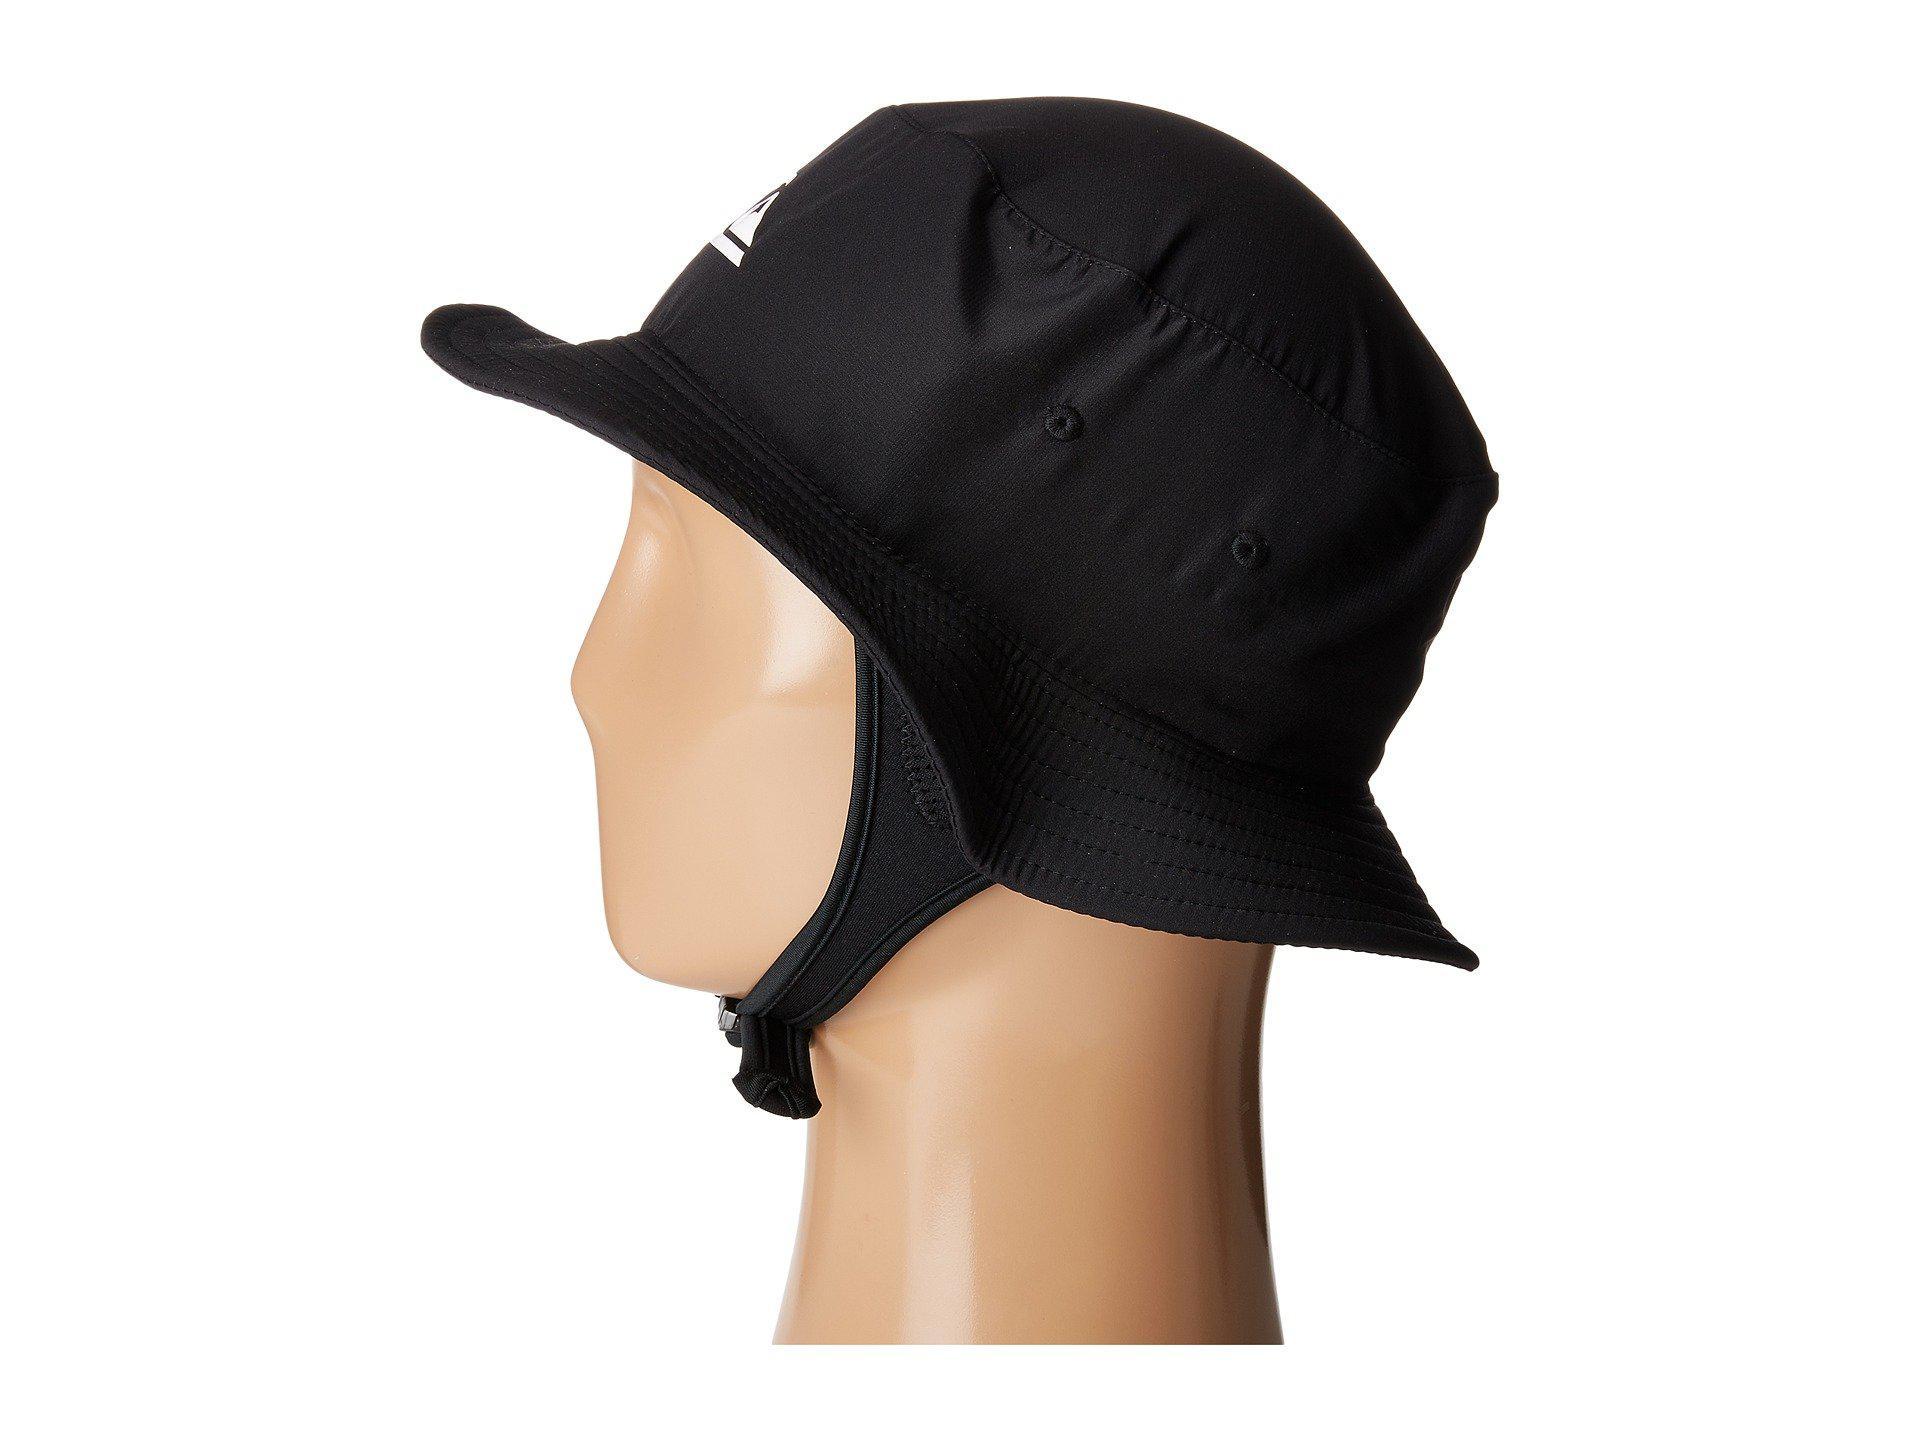 Lyst - Quiksilver Bushmaster Surf Hat (black) Bucket Caps in Black ... 5da4cd34953